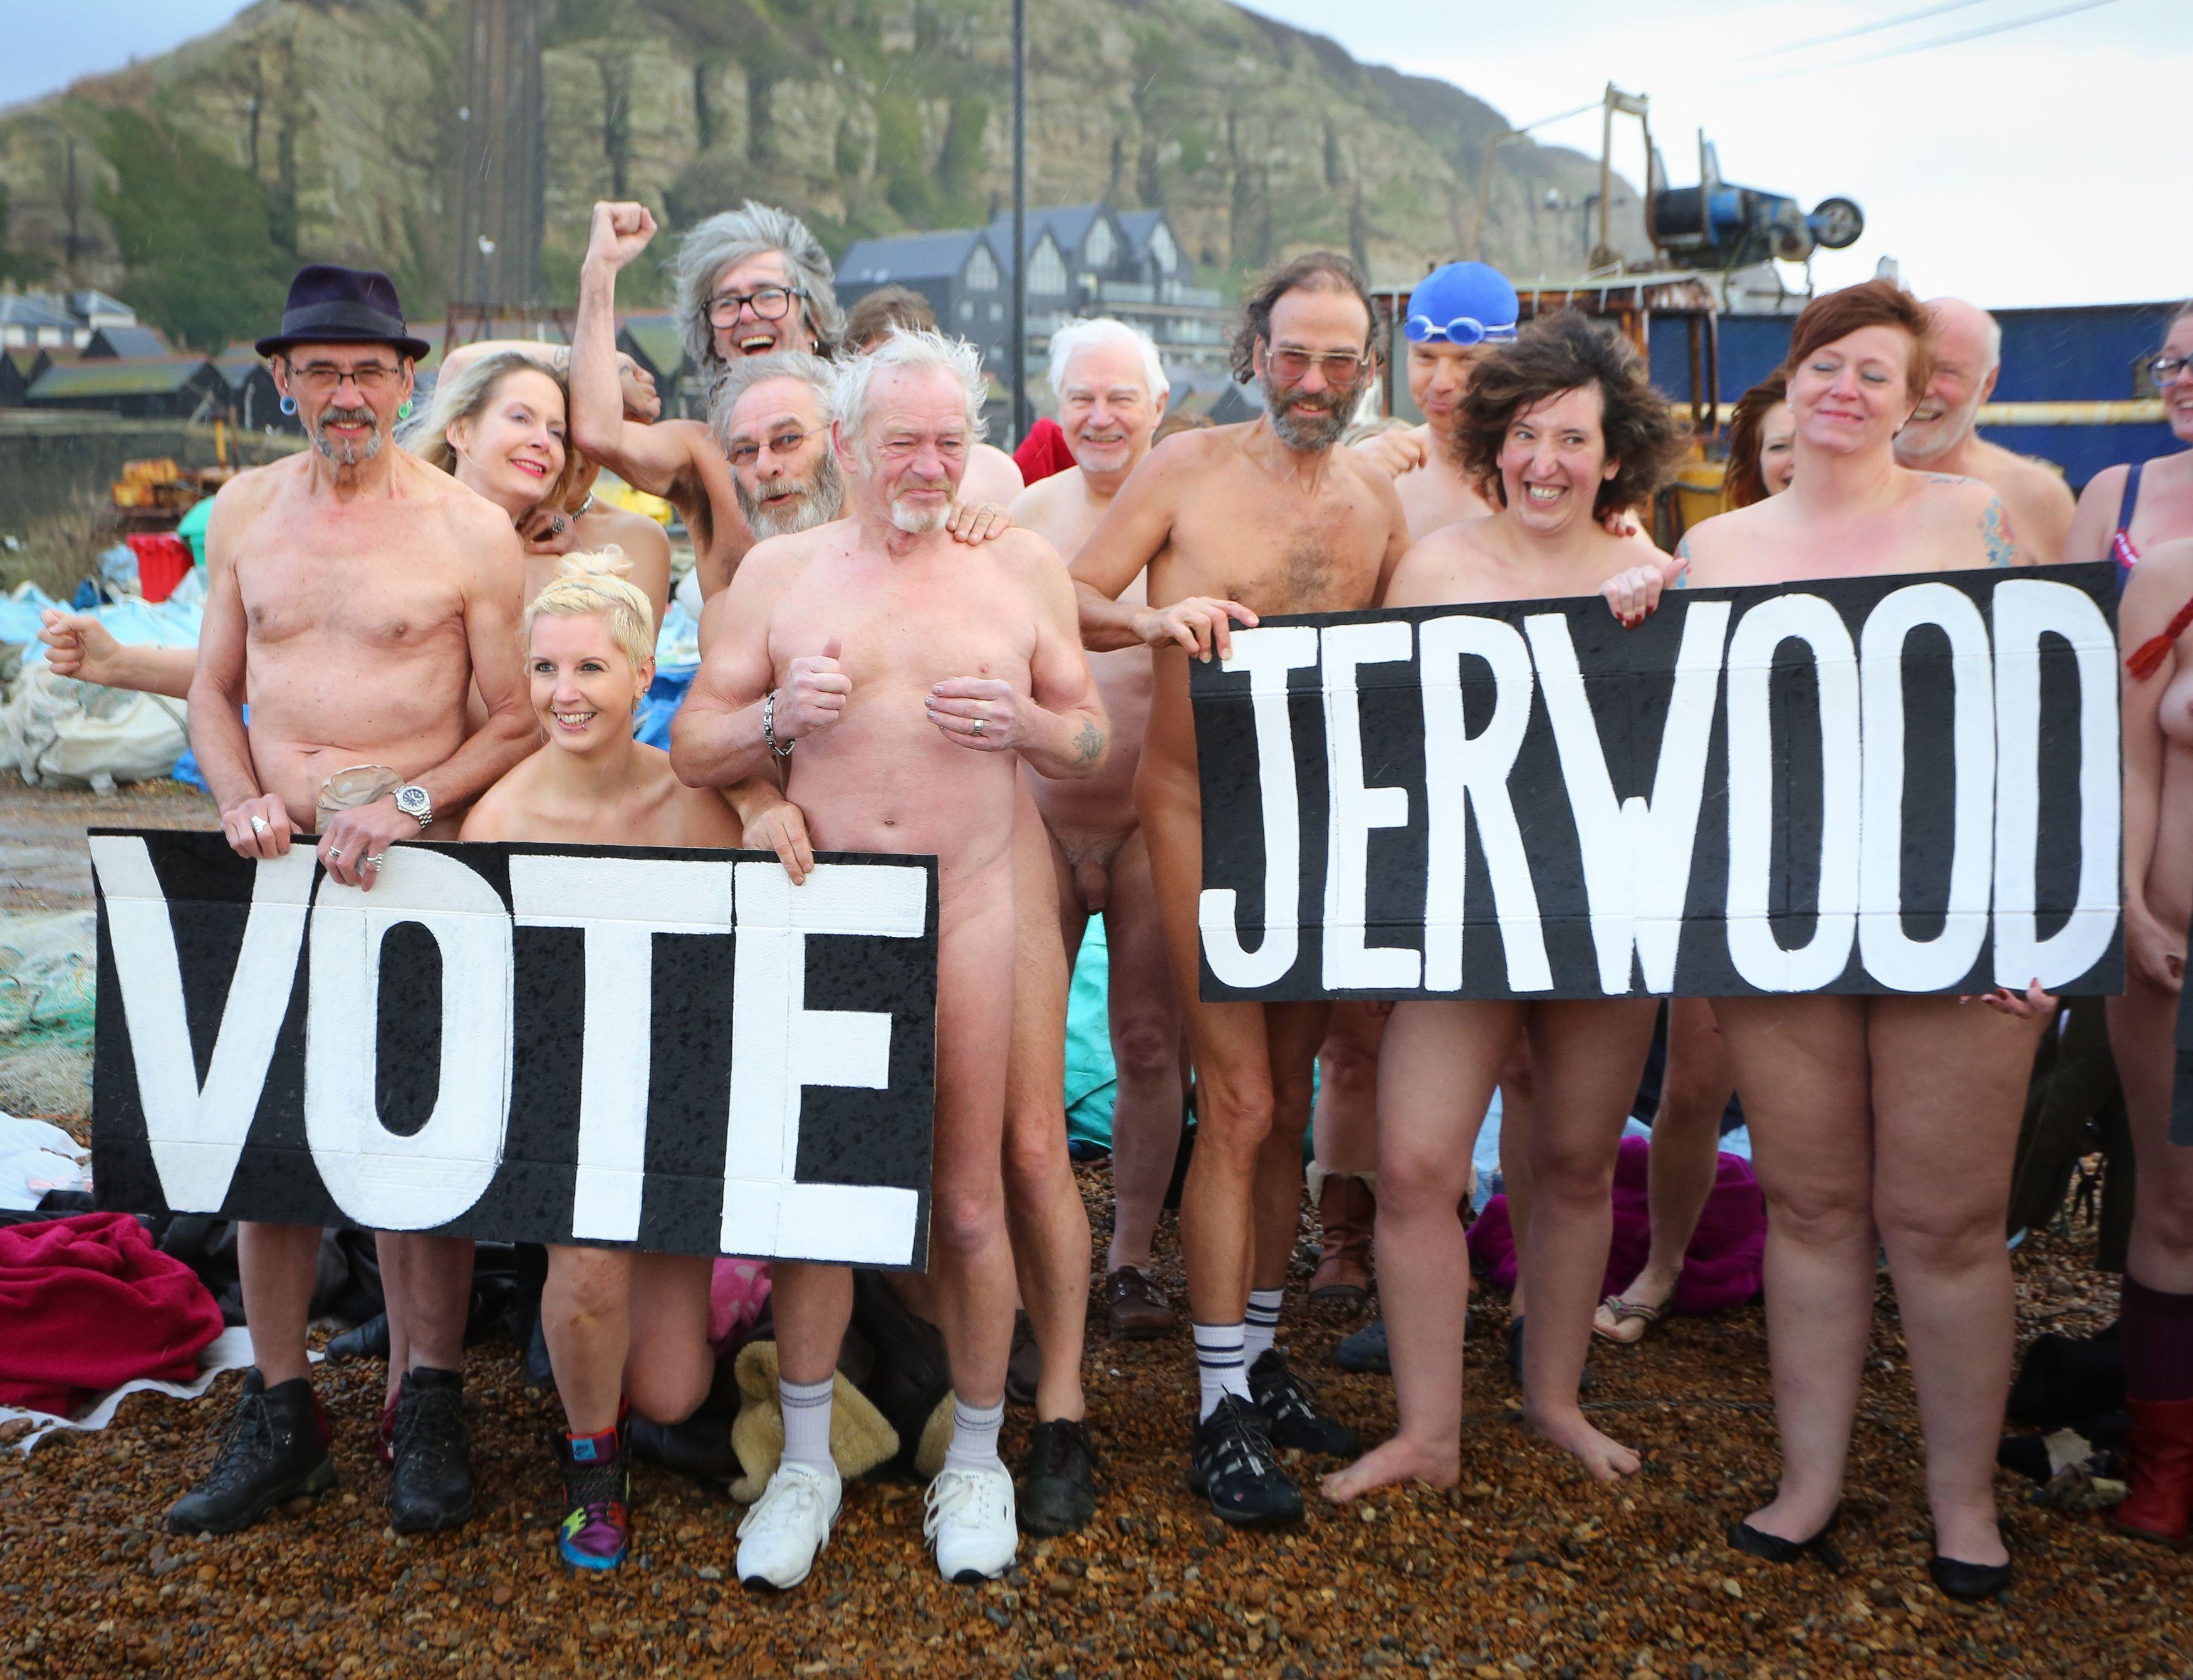 Gallery: Flash mob strip for beach stunt